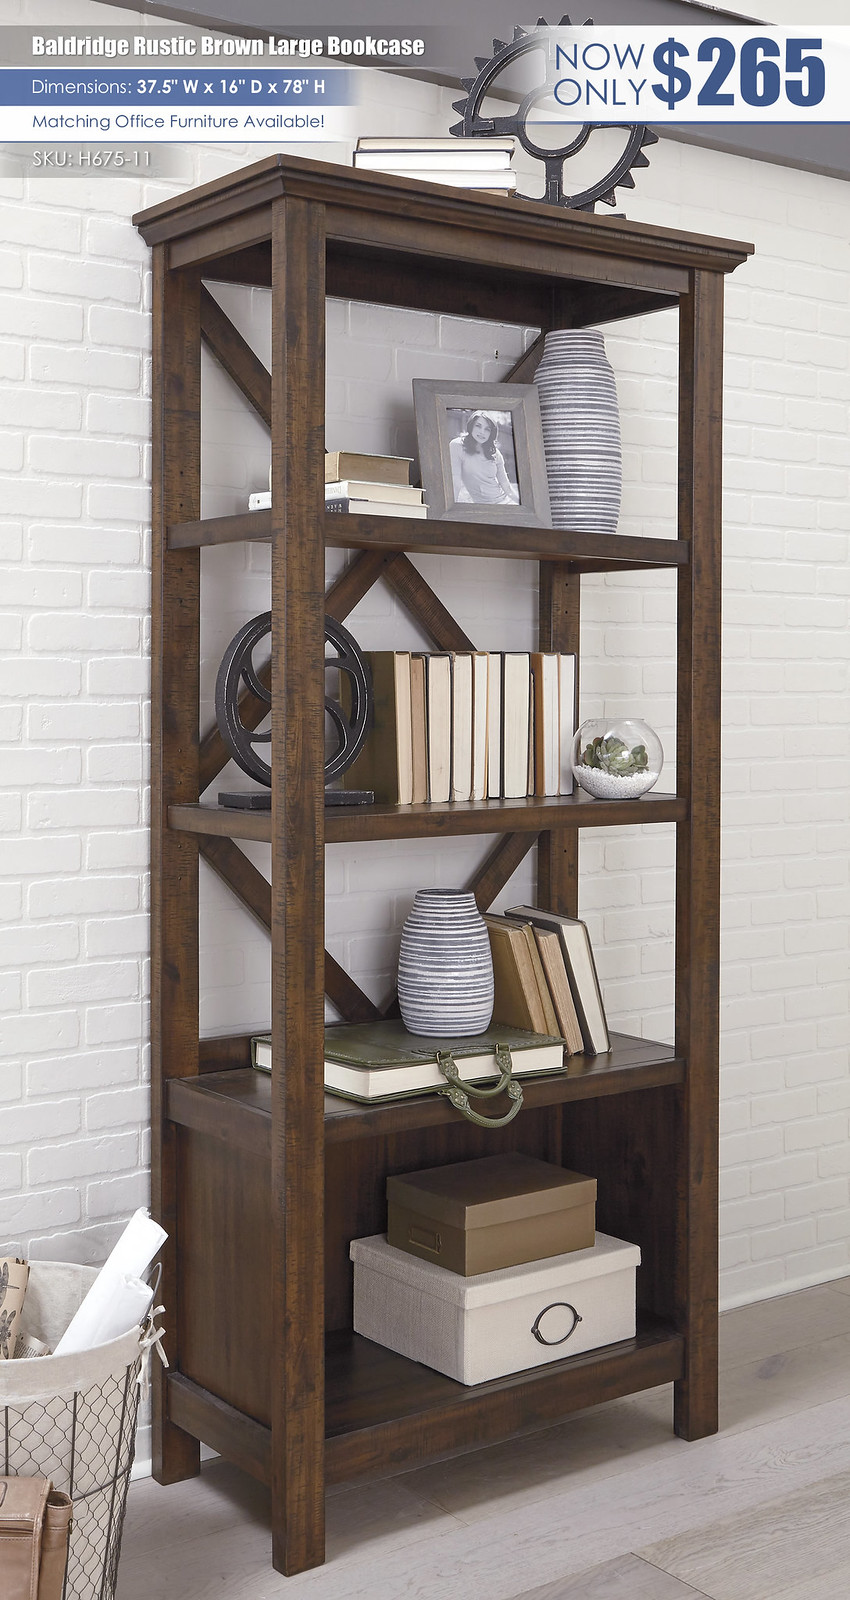 Bladridge Rustic Brown Large Bookcase_H675-17